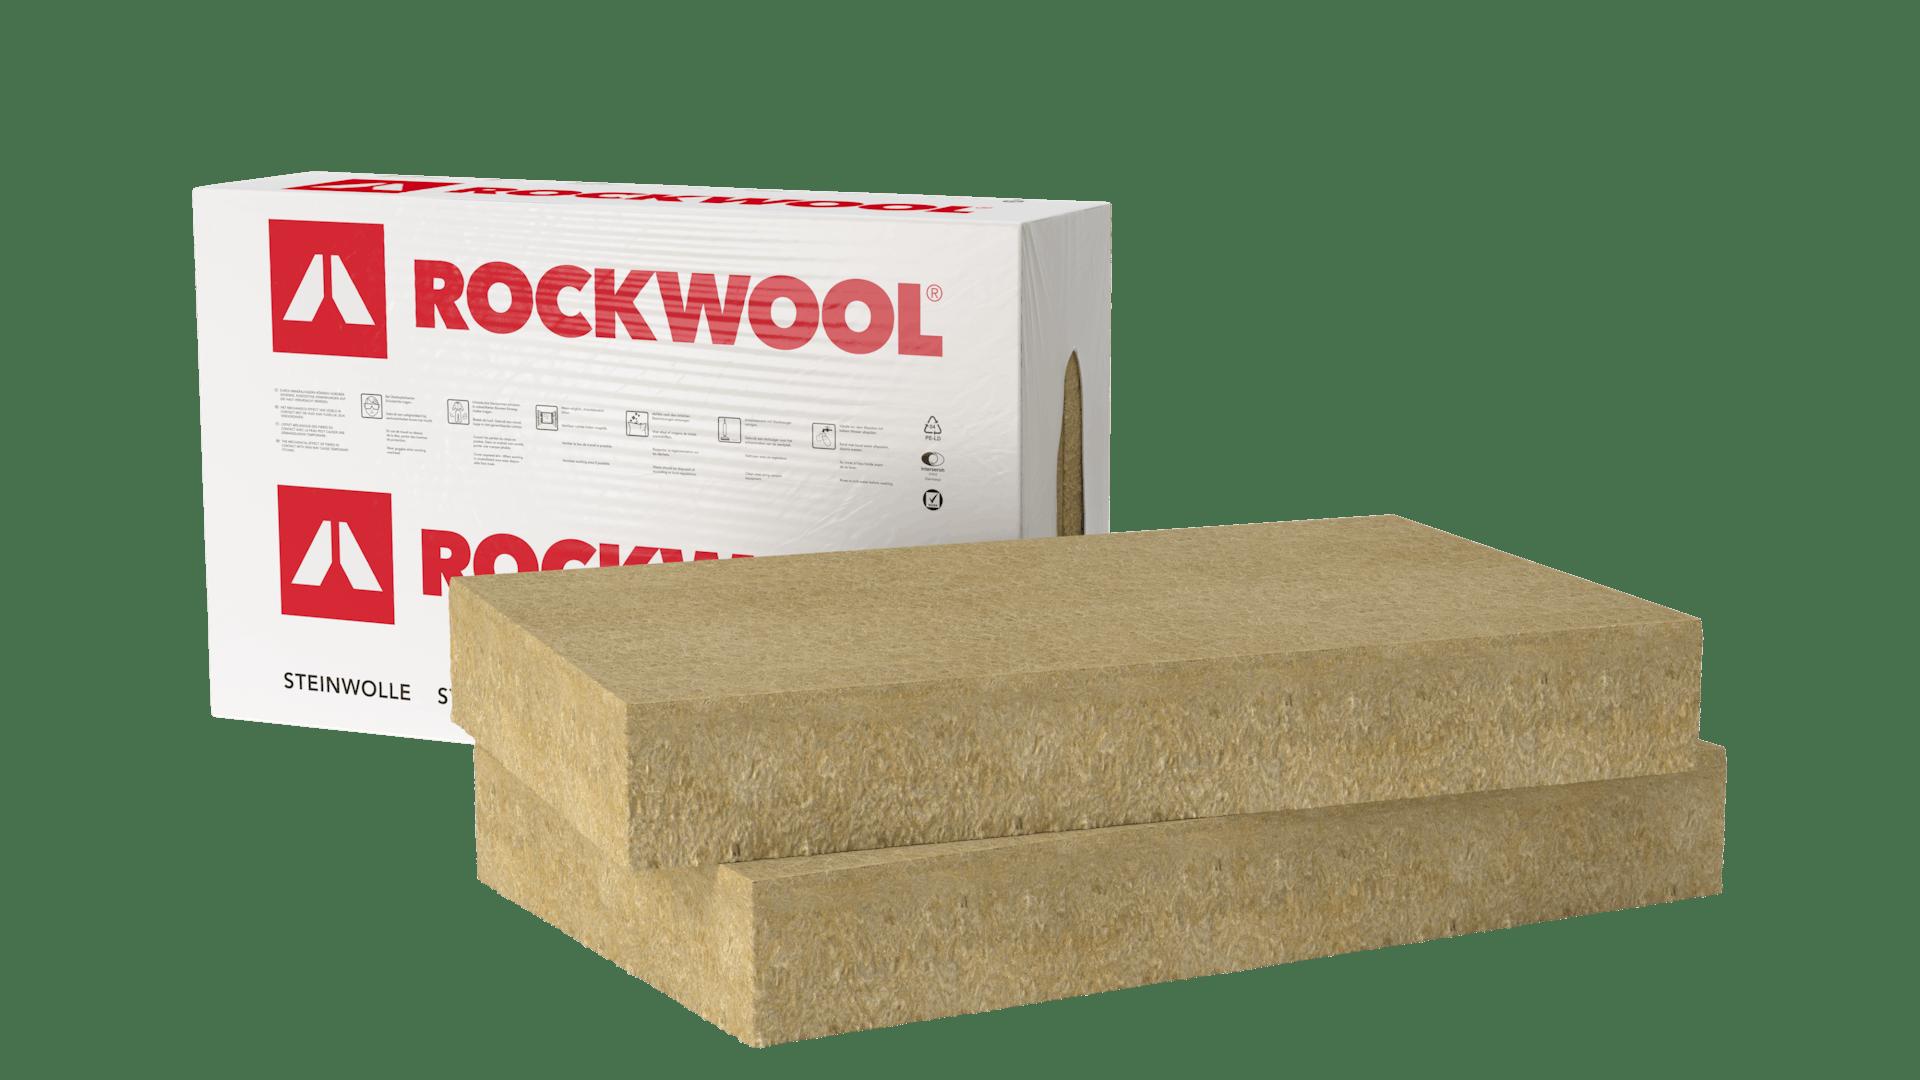 product, flatroof, flat roof, fri, bitrock, plate, package, packet,1000x600 mm, bonded flatroof, germany, PIM